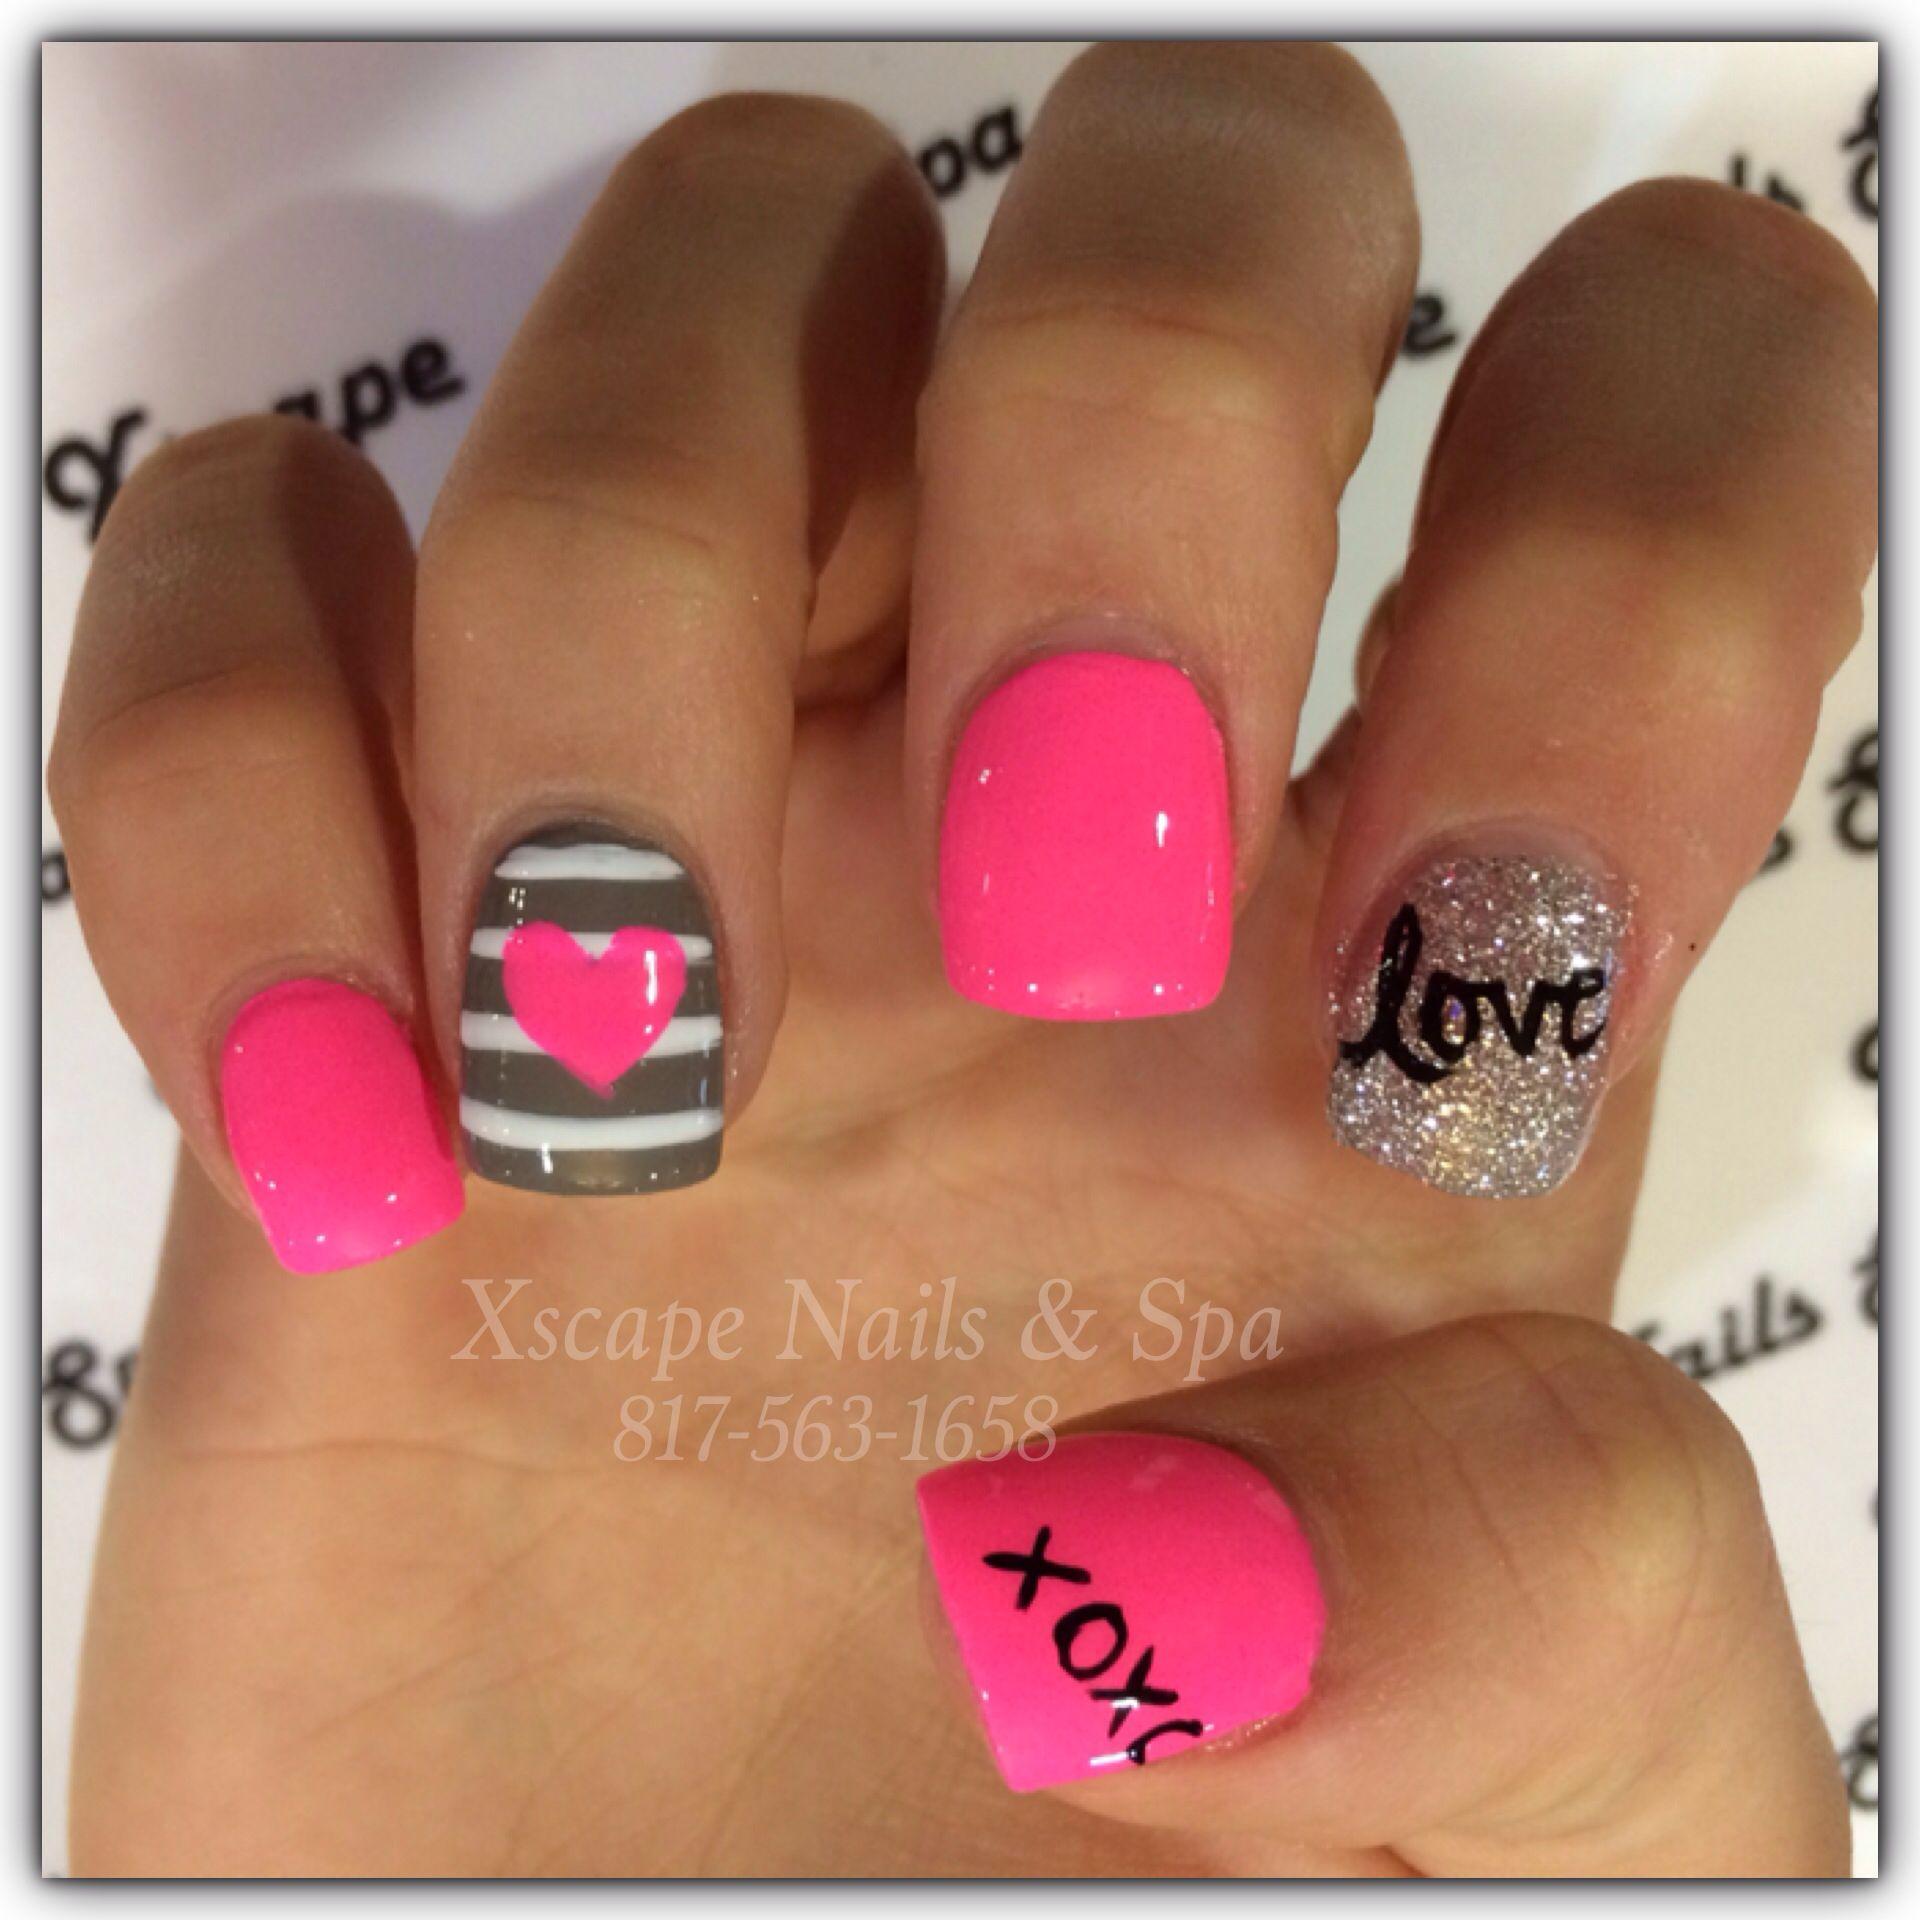 valentines day design cute nail designs discover and share your nail design - Cute Nail Designs For Valentines Day